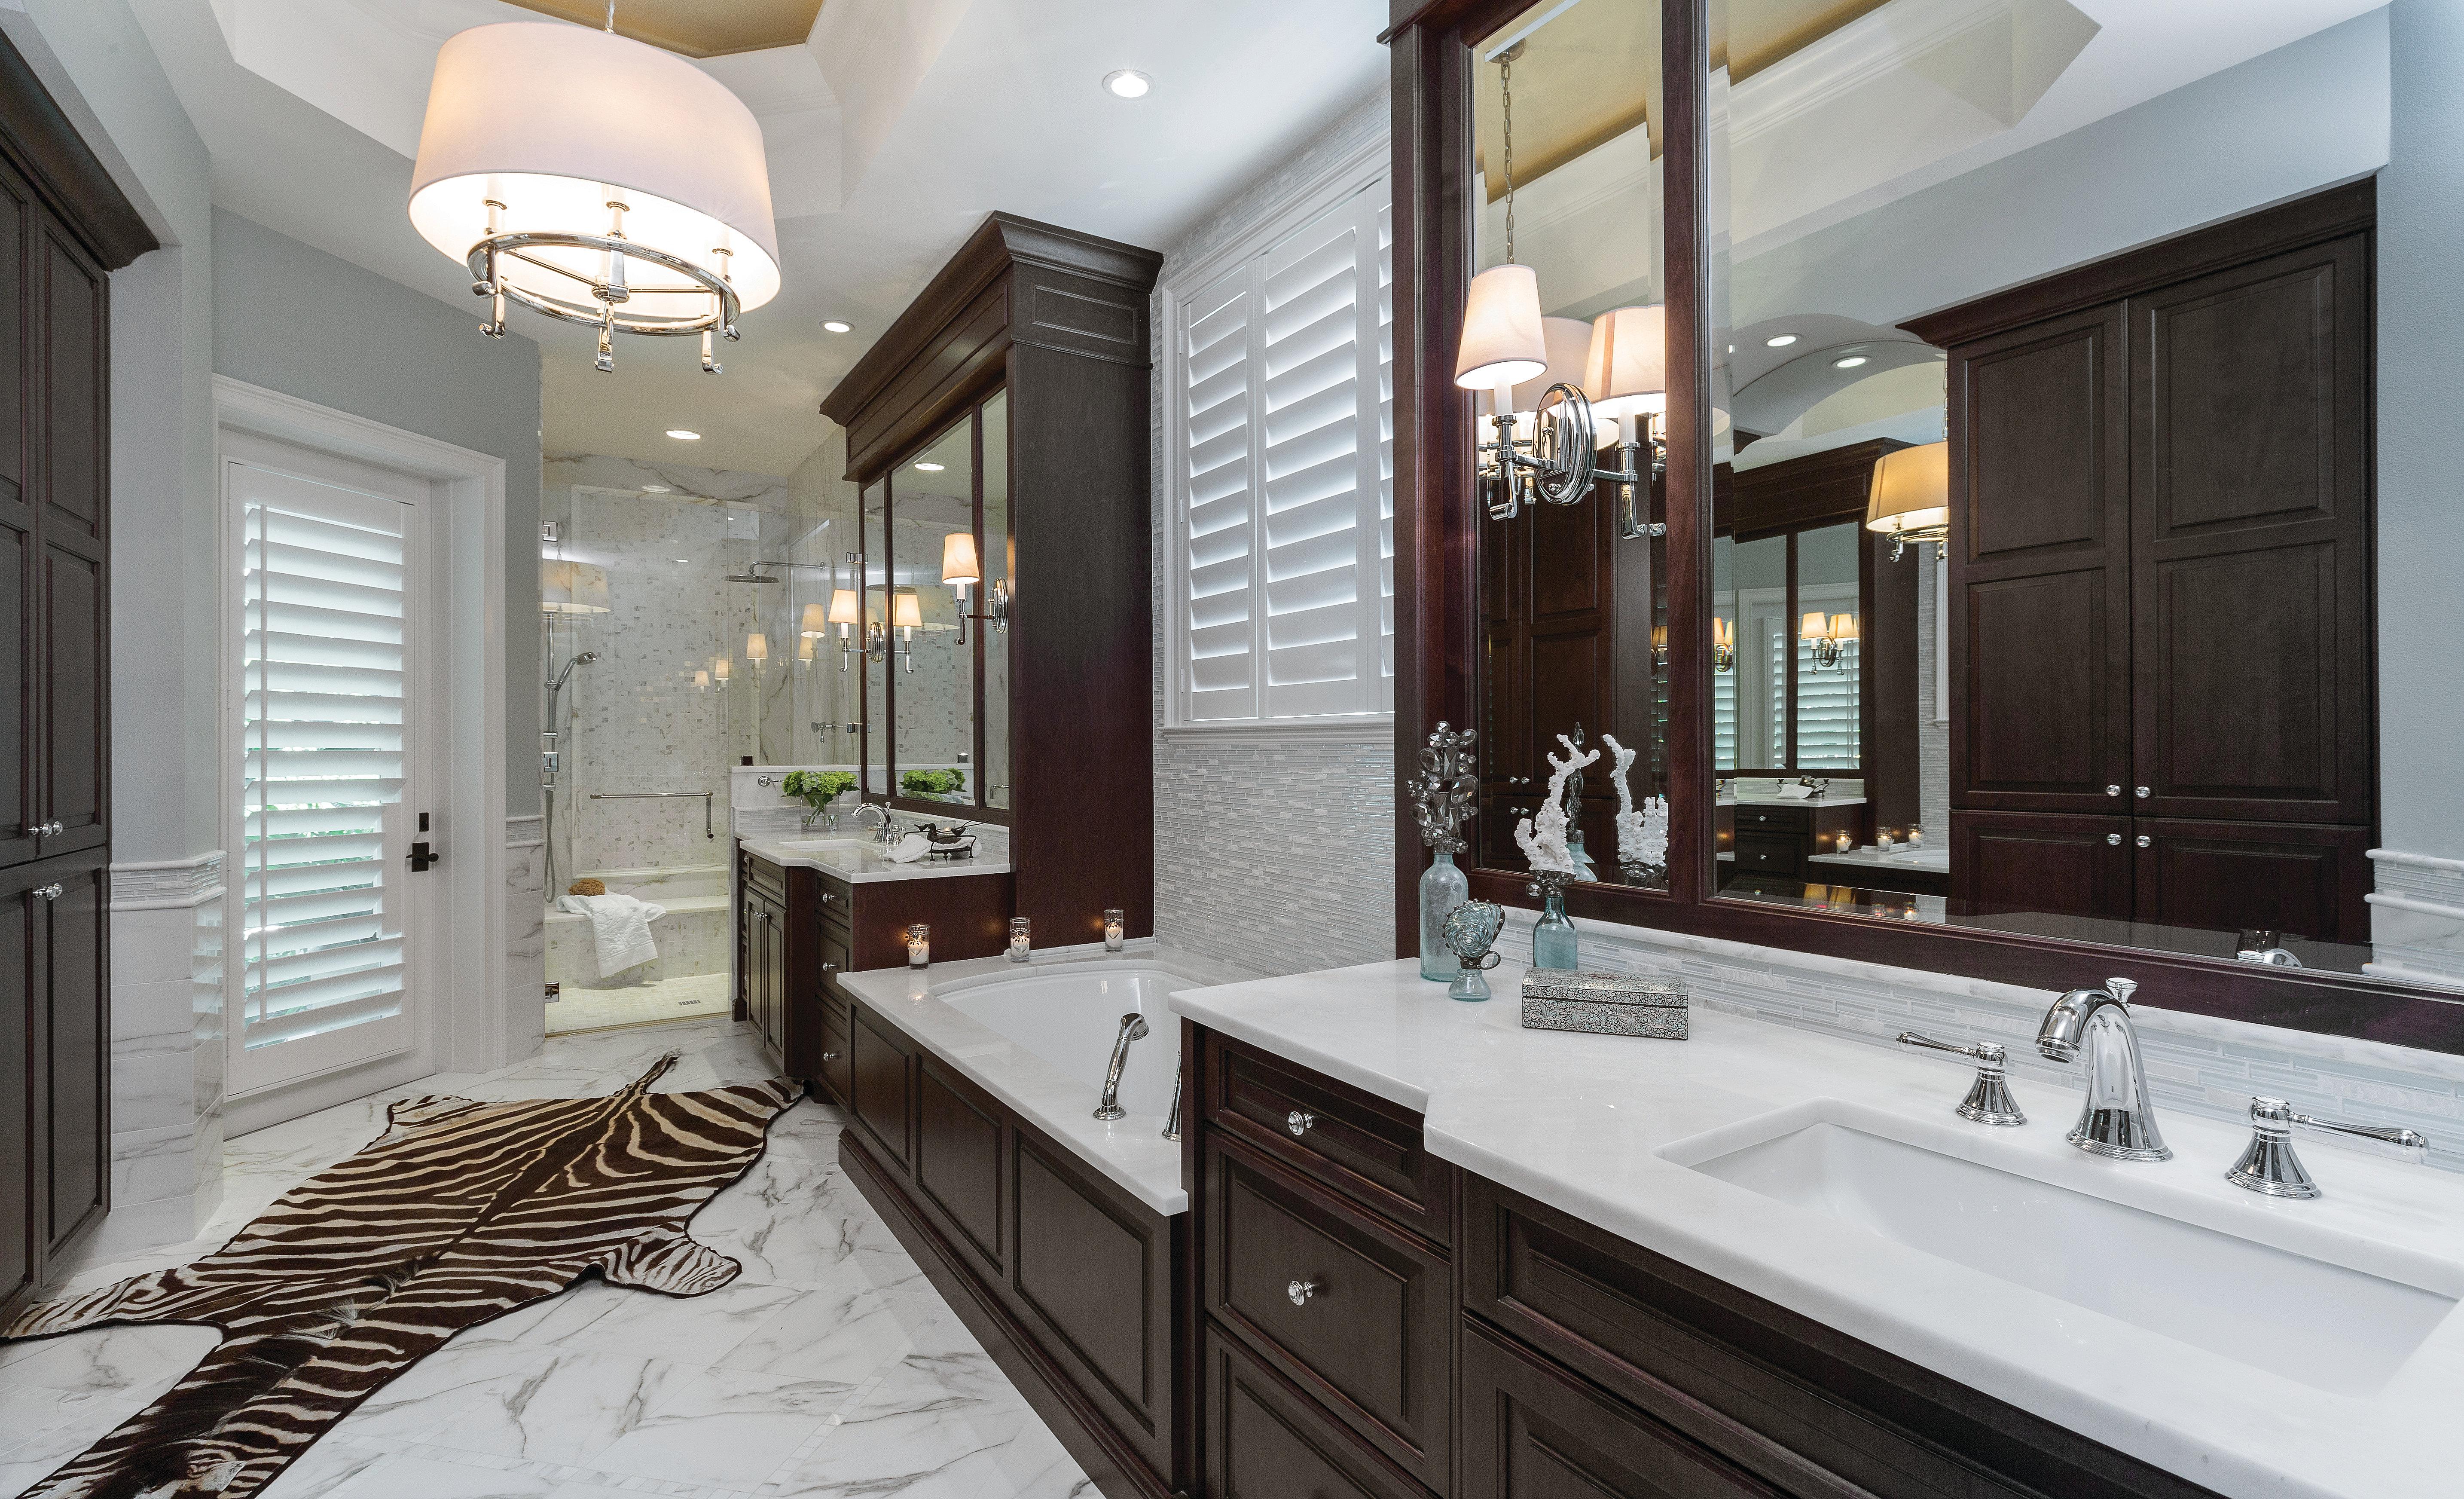 Studio G Home Design Is An Award Winning Top Sarasota FL. Interior Design  Firm. For An Appointment Call 941.504.5235